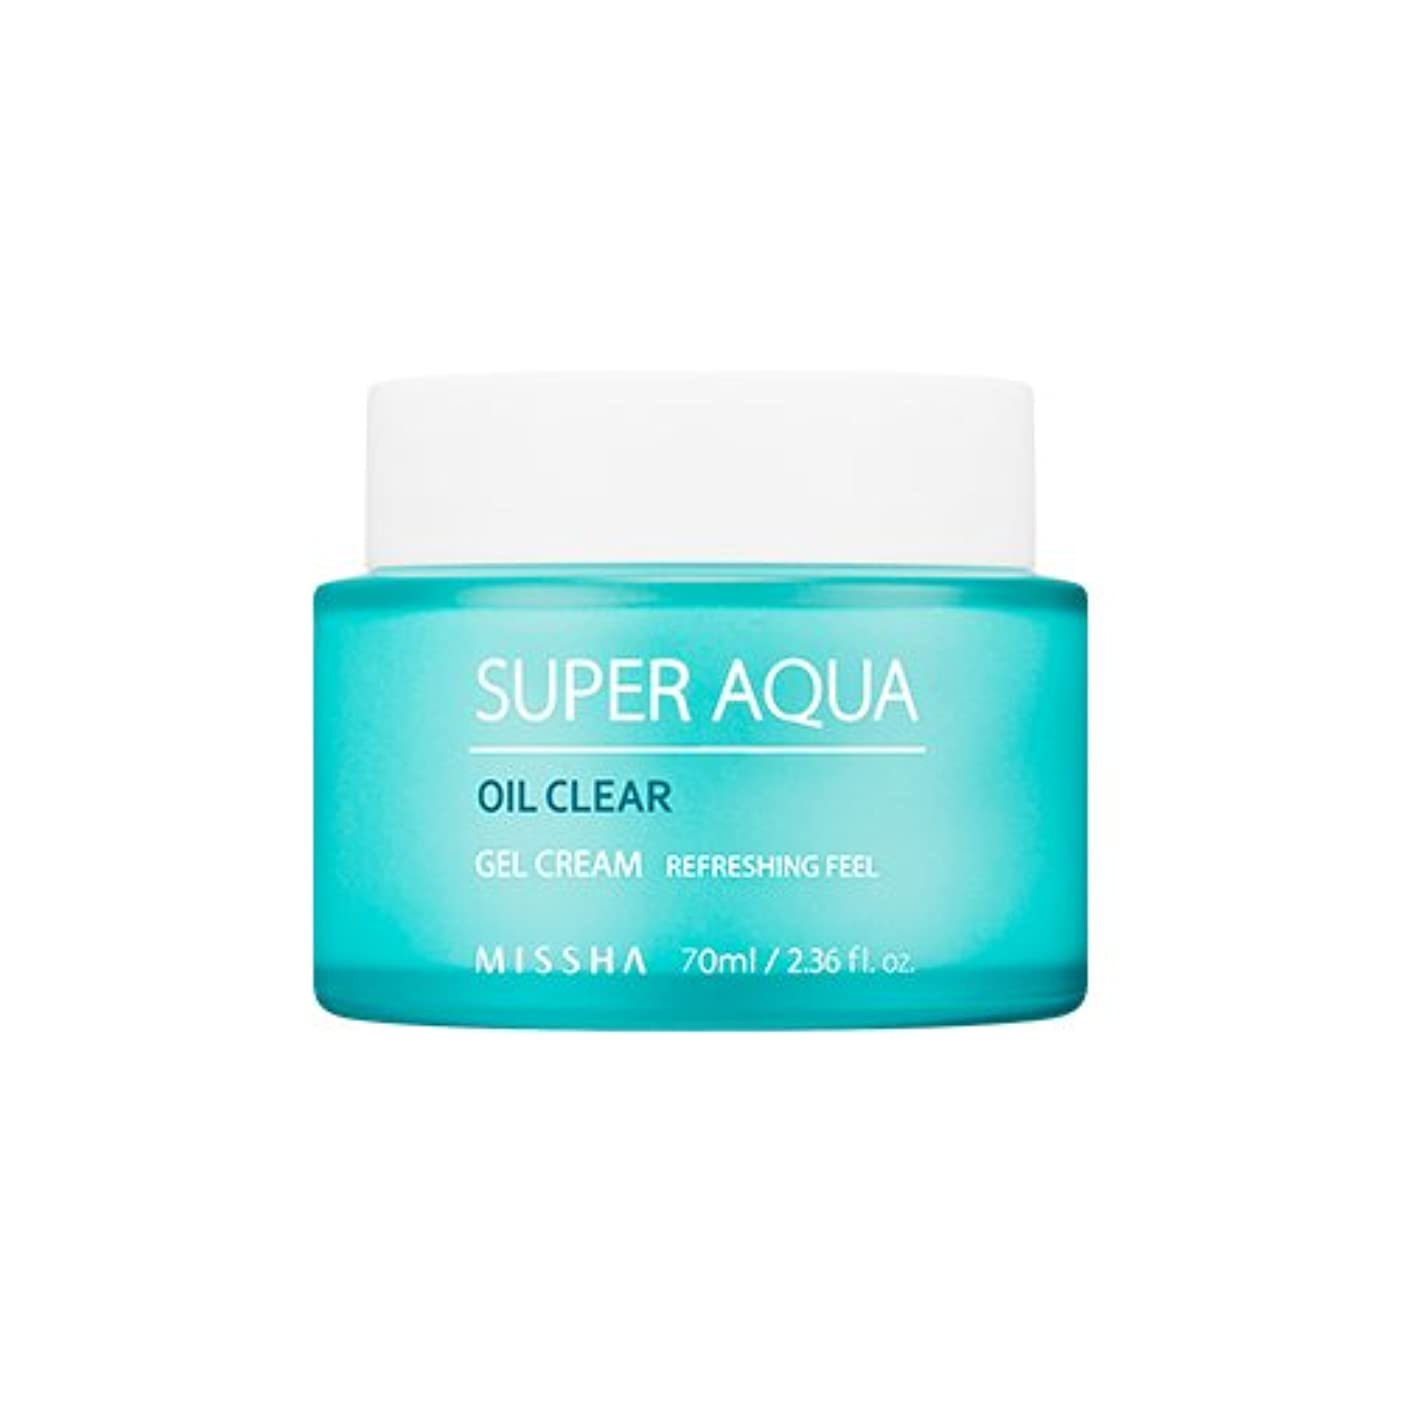 MISSHA Super Aqua Oil Clear Gel Cream 70ml/ミシャ スーパー アクア オイル クリア ジェル クリーム 70ml [並行輸入品]